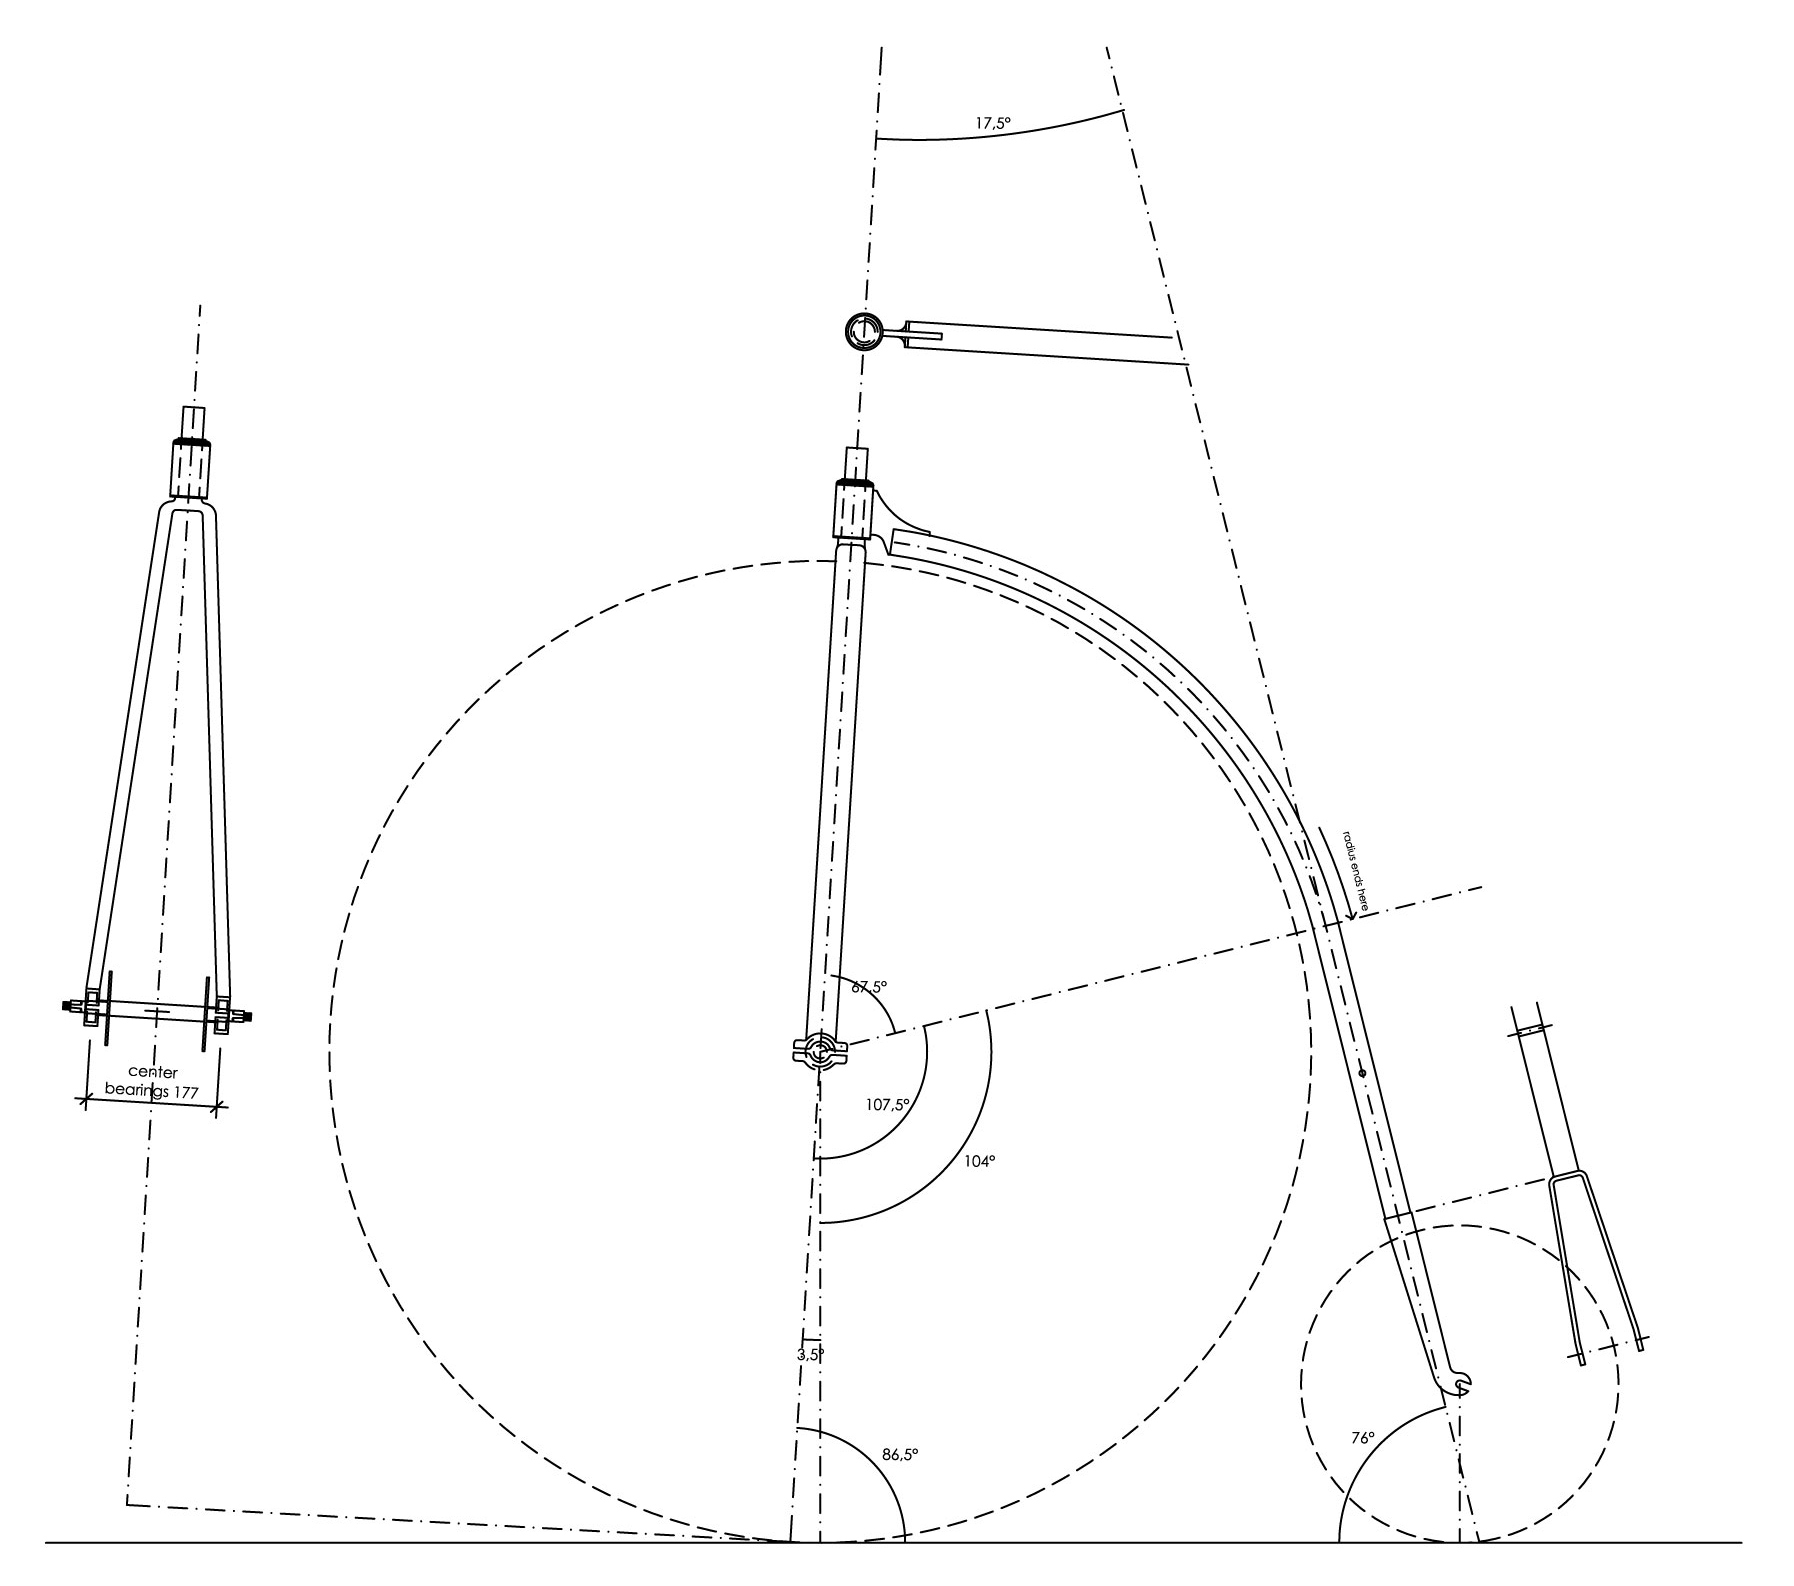 C:GamlaDatorndokumentBRAVEprivatSHWmarch15 geometry52 (1)